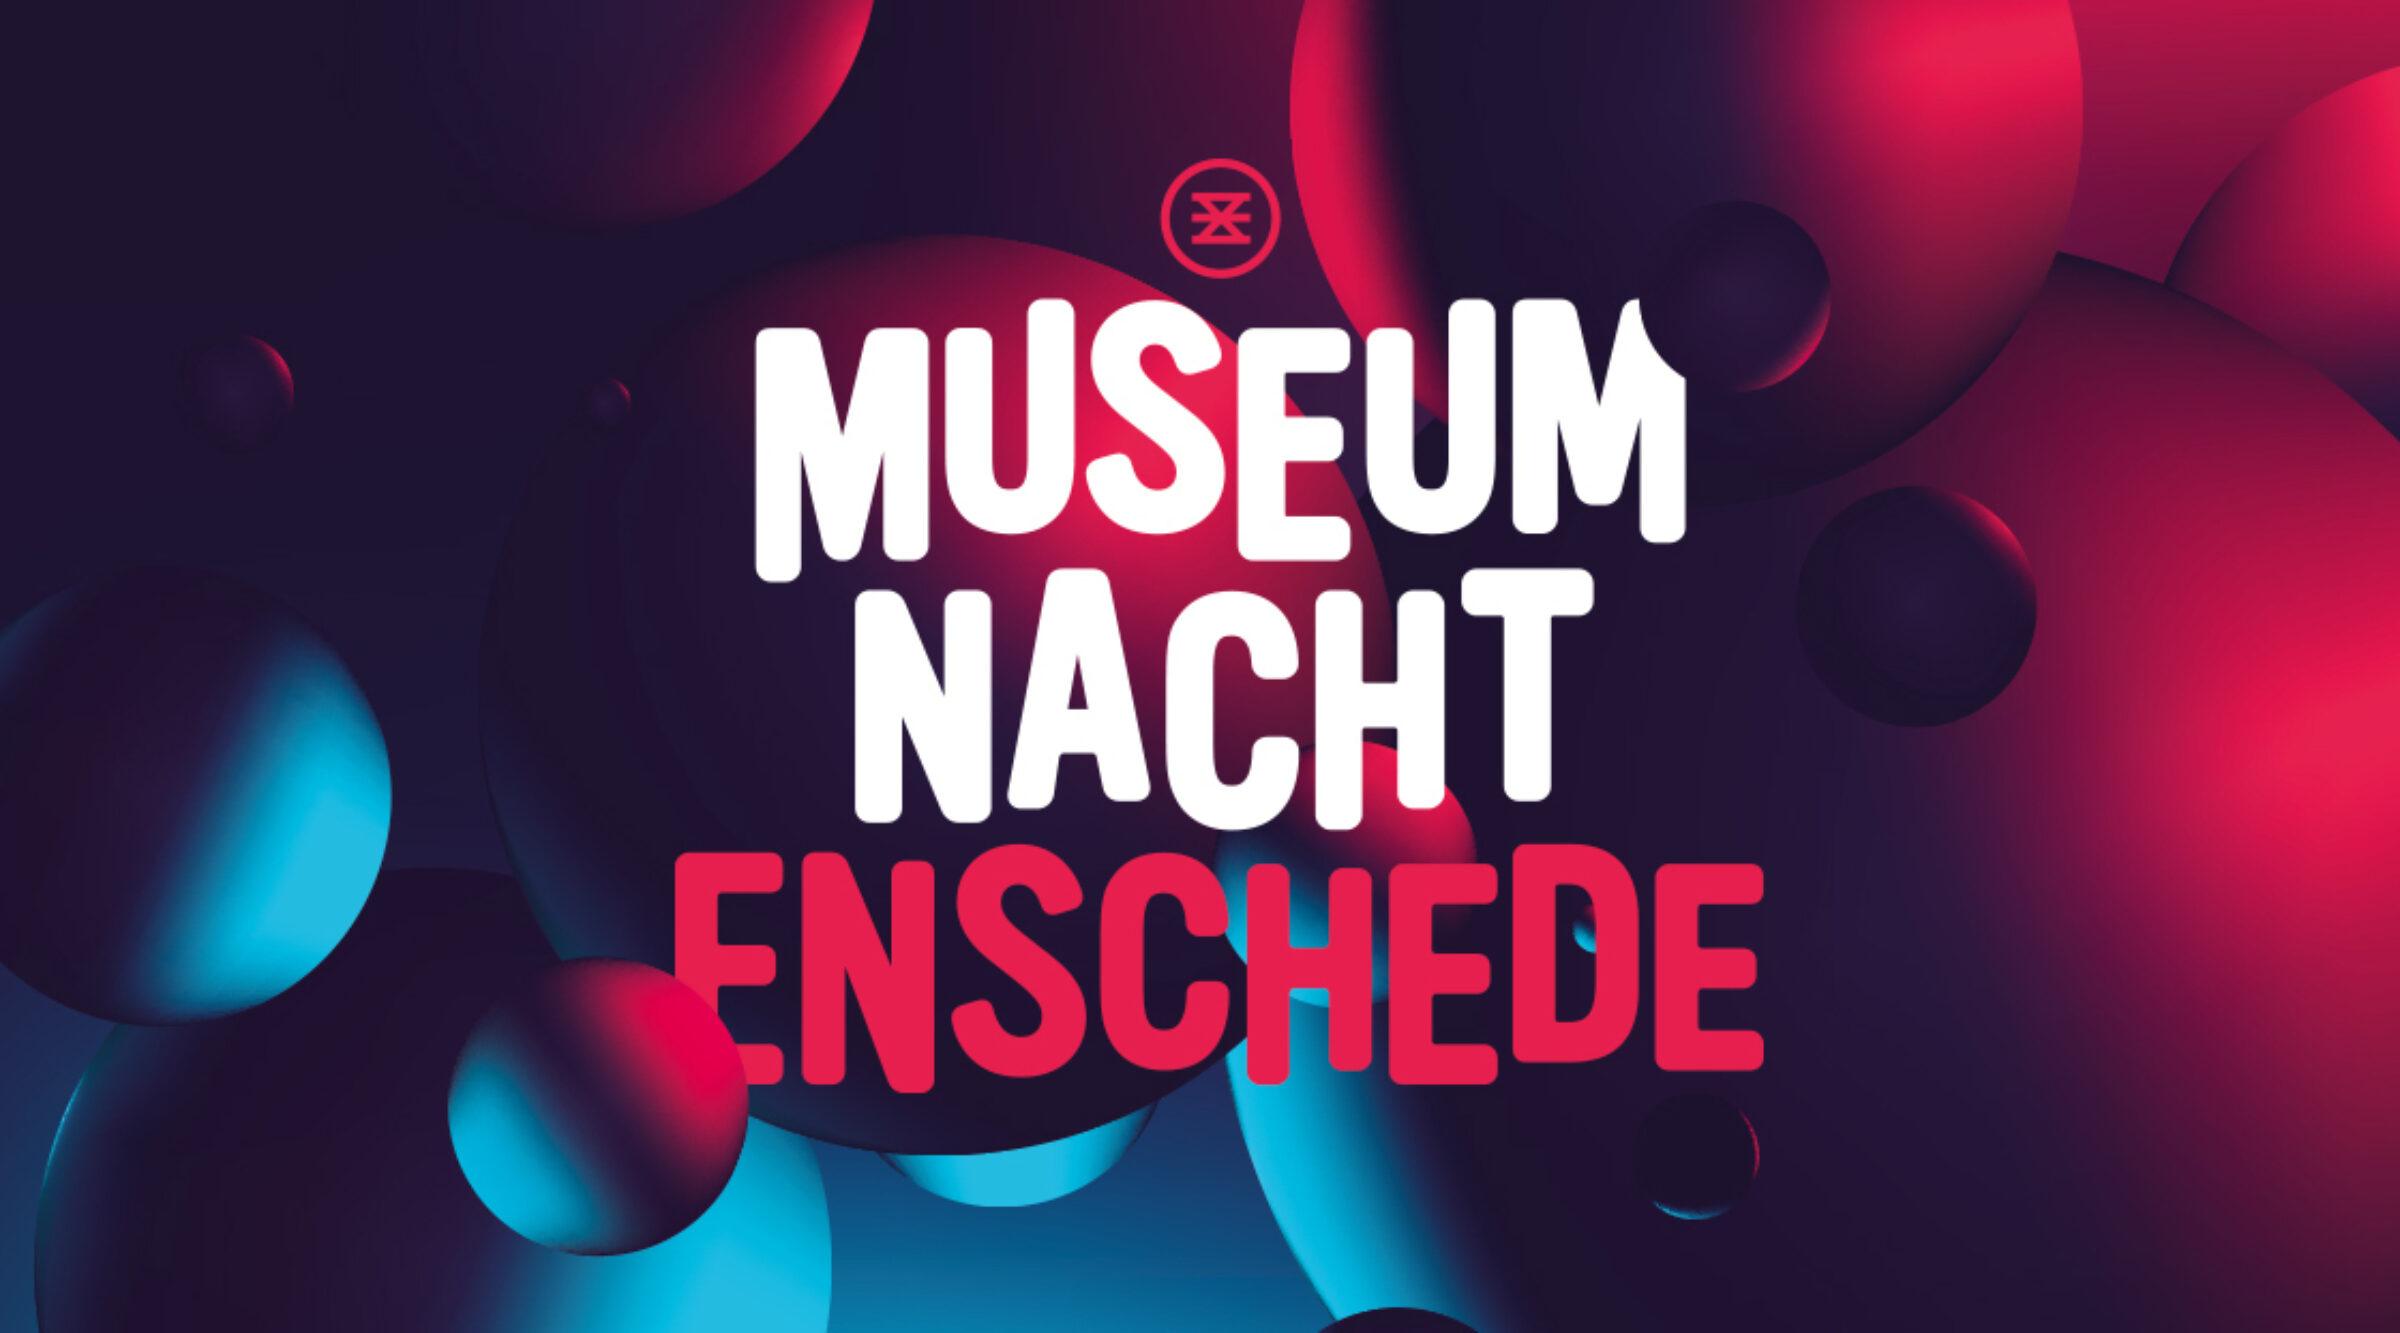 Museumnacht Enschede 3374 1565696365 35hxmn23c8